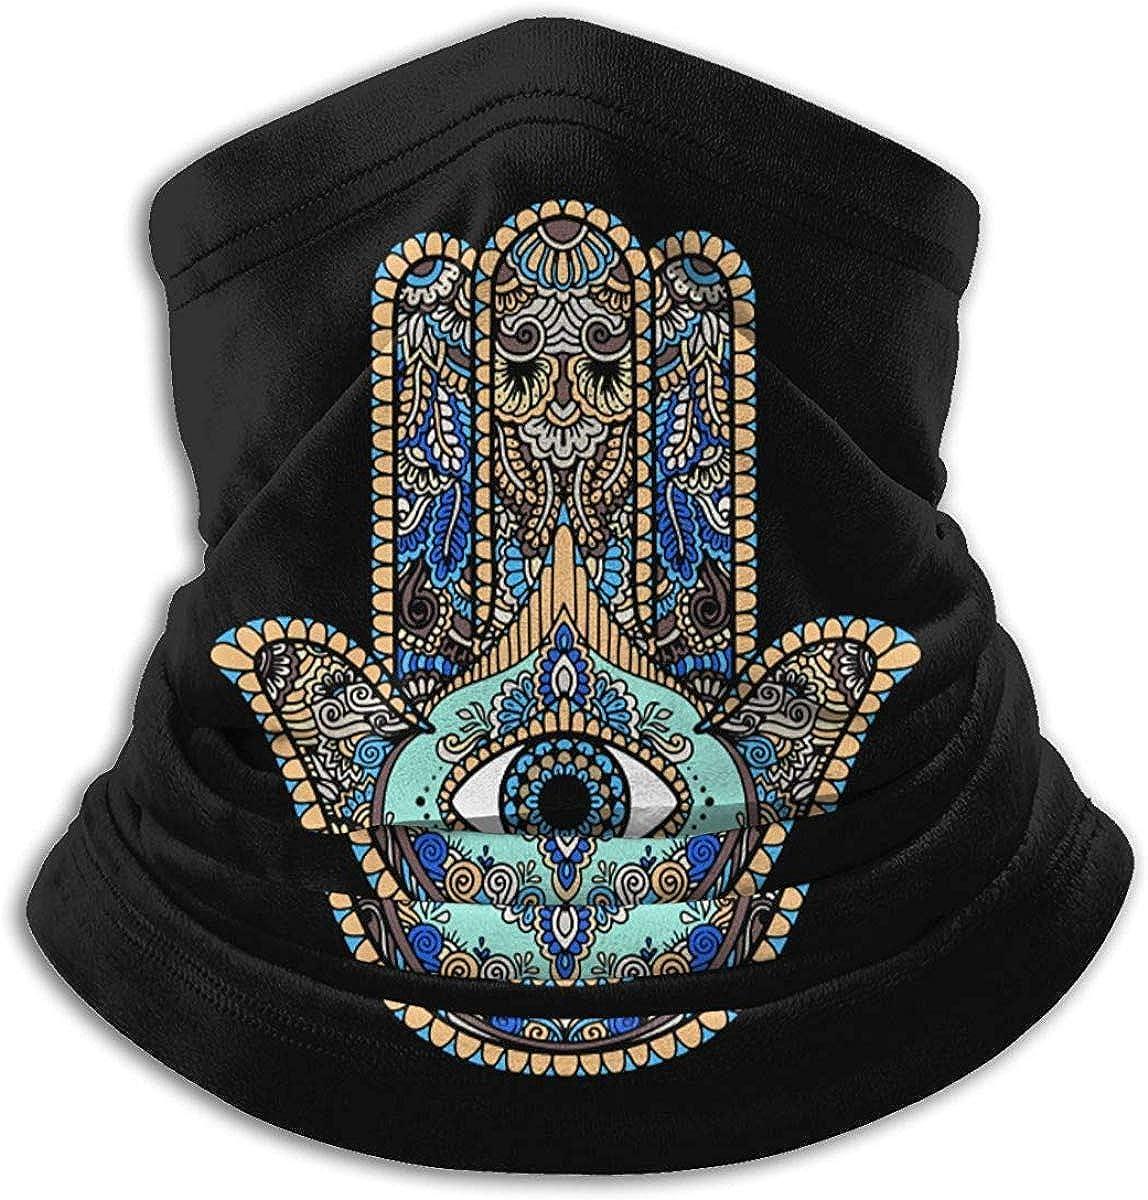 Hand of Fatima Microfiber Neck Warmer Balaclavas Soft Fleece Headwear Face Scarf Mask for Winter